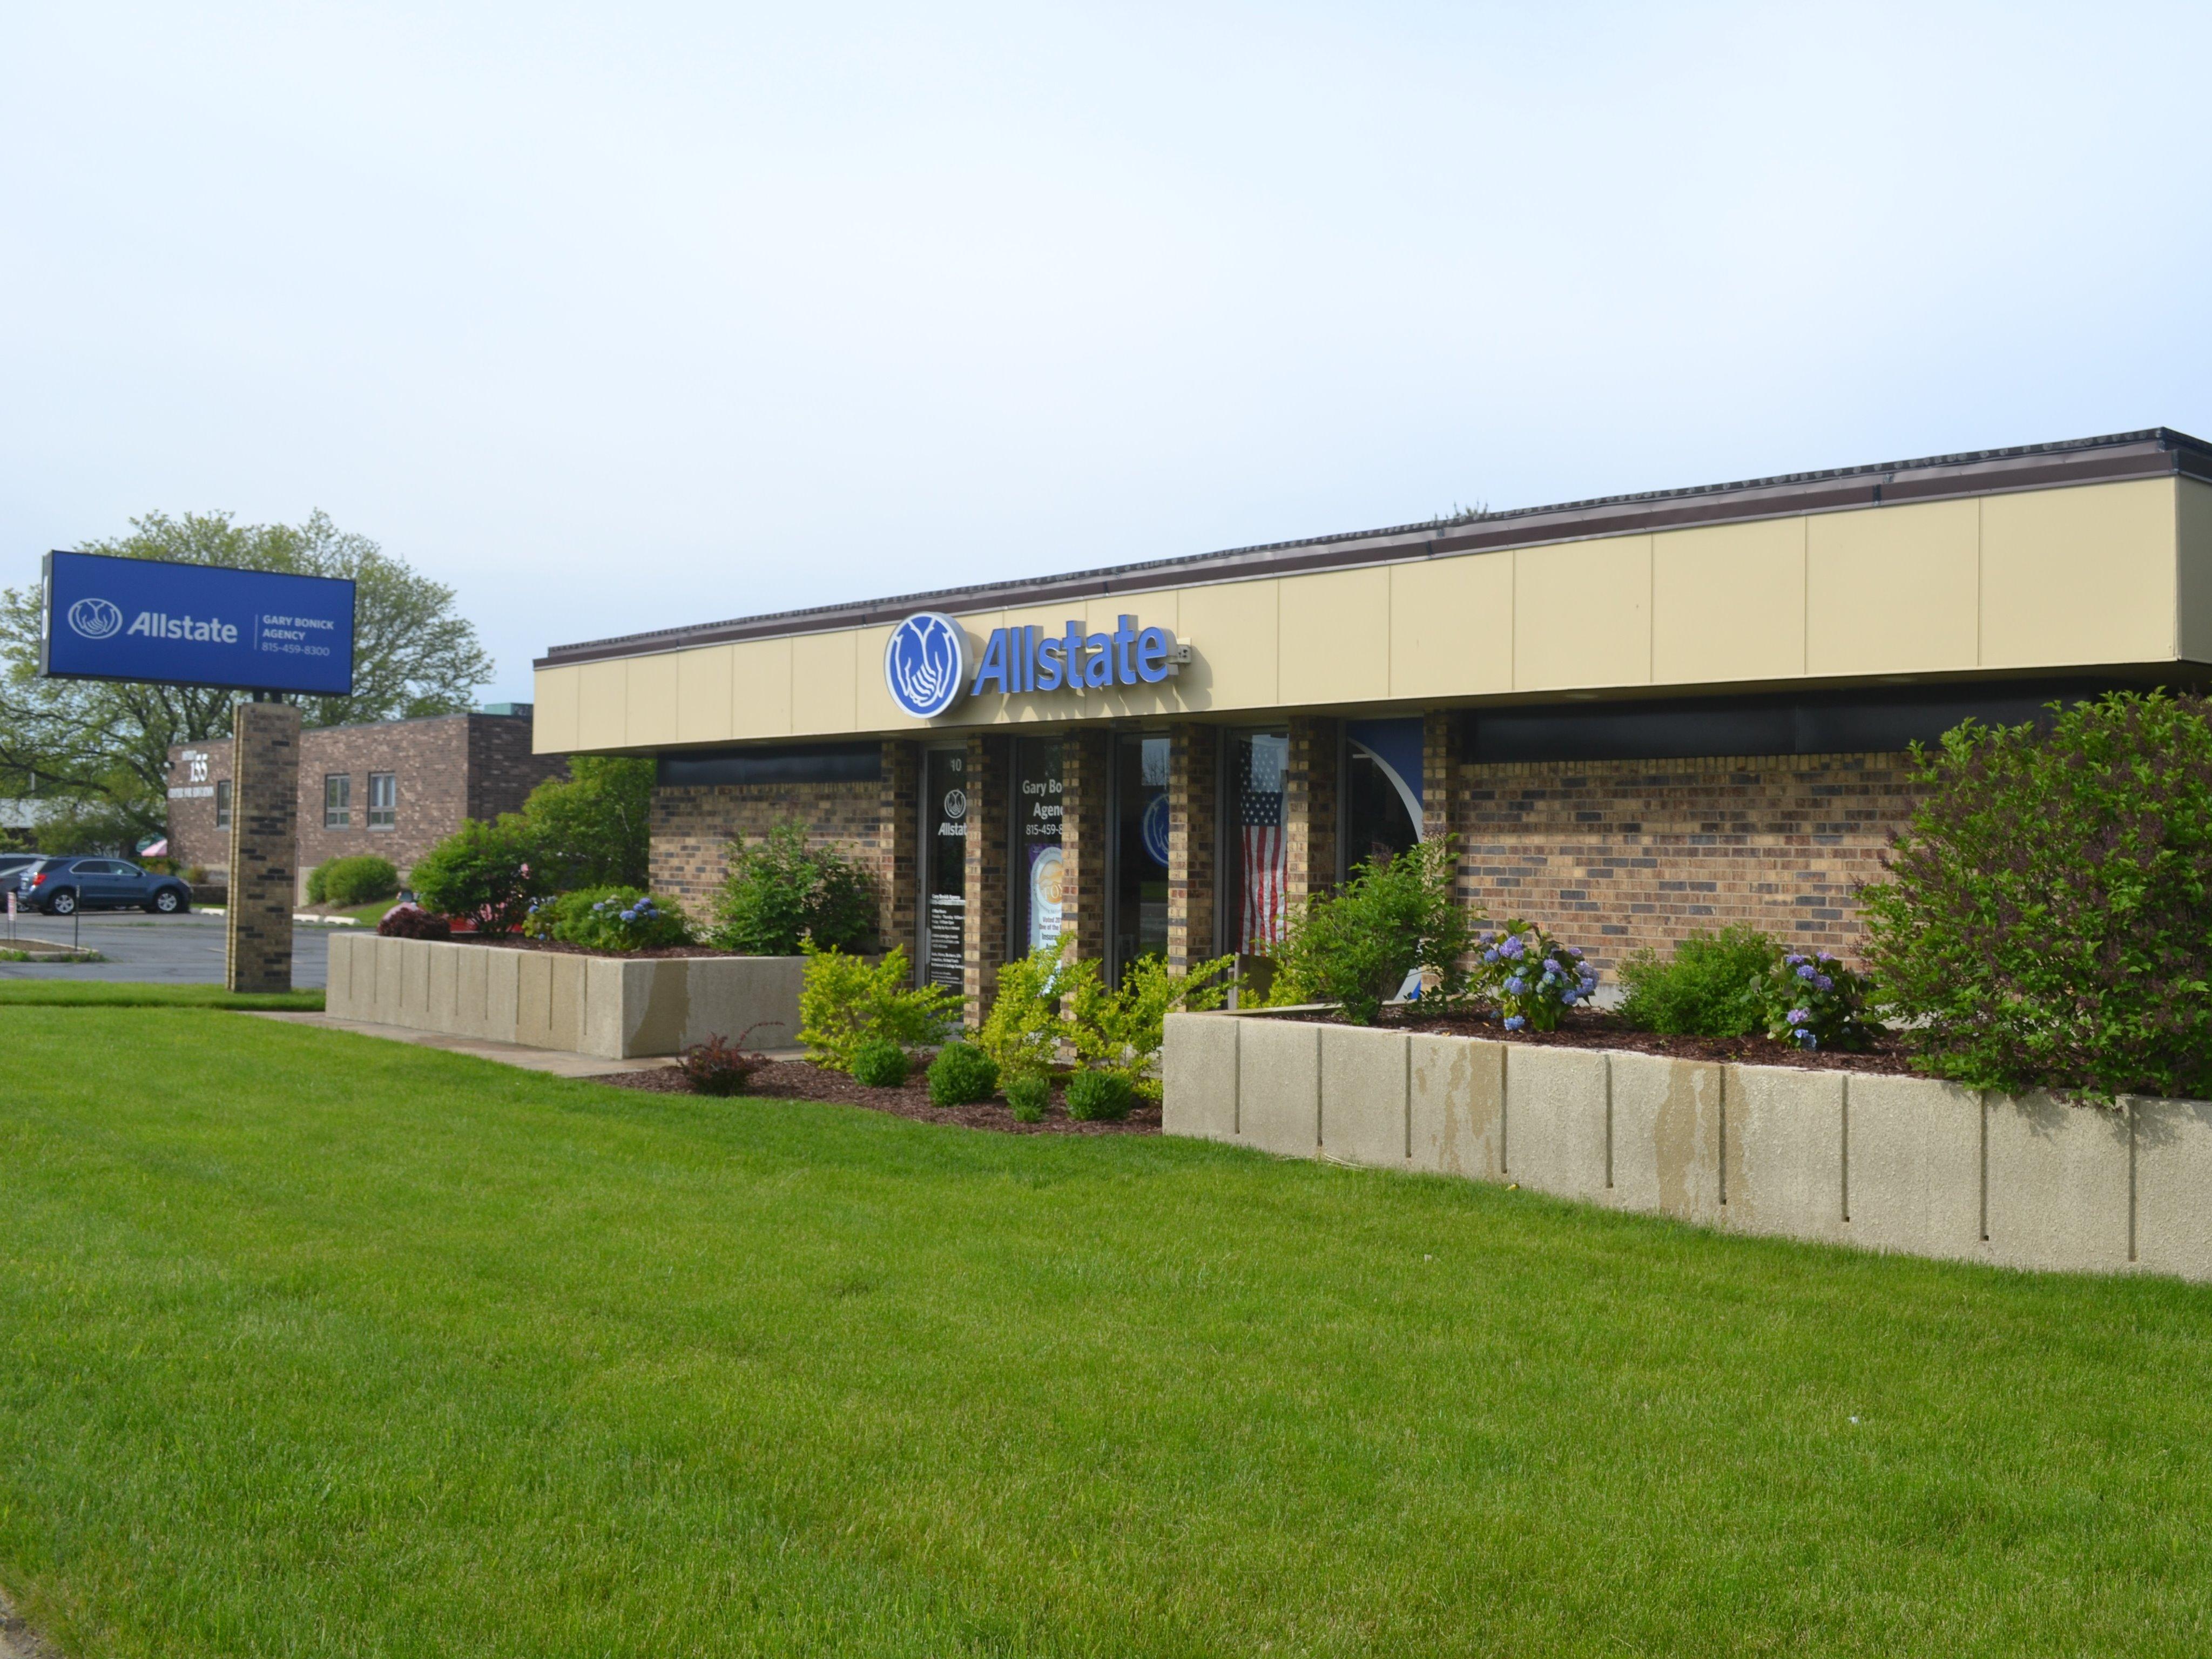 Gary Bonick: Allstate Insurance image 3